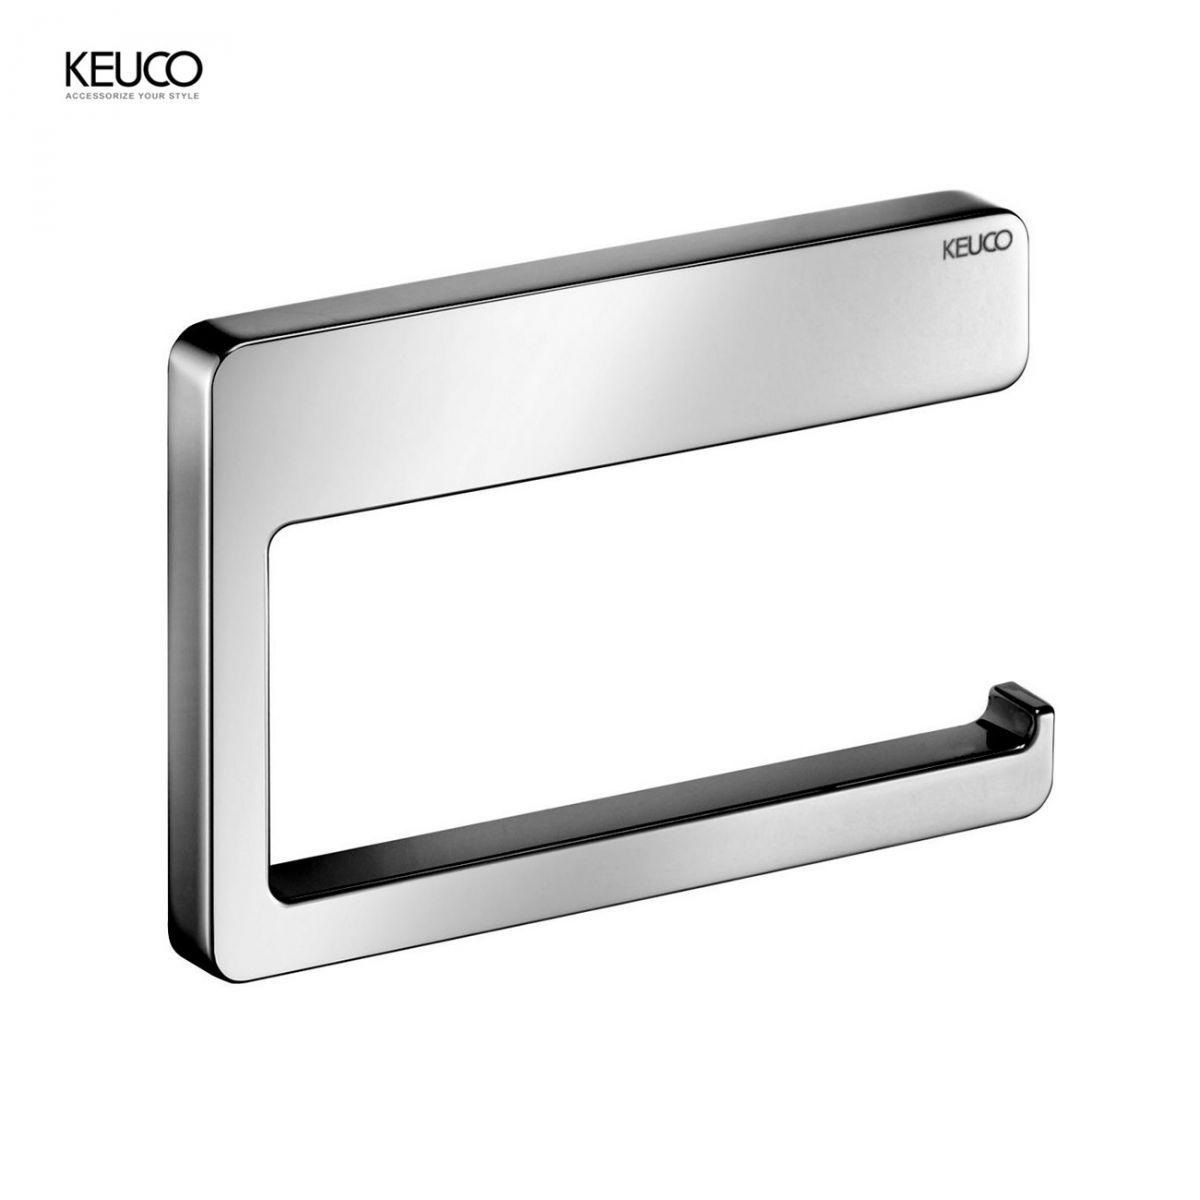 Keuco Moll Toilet Roll Holder Uk Bathrooms